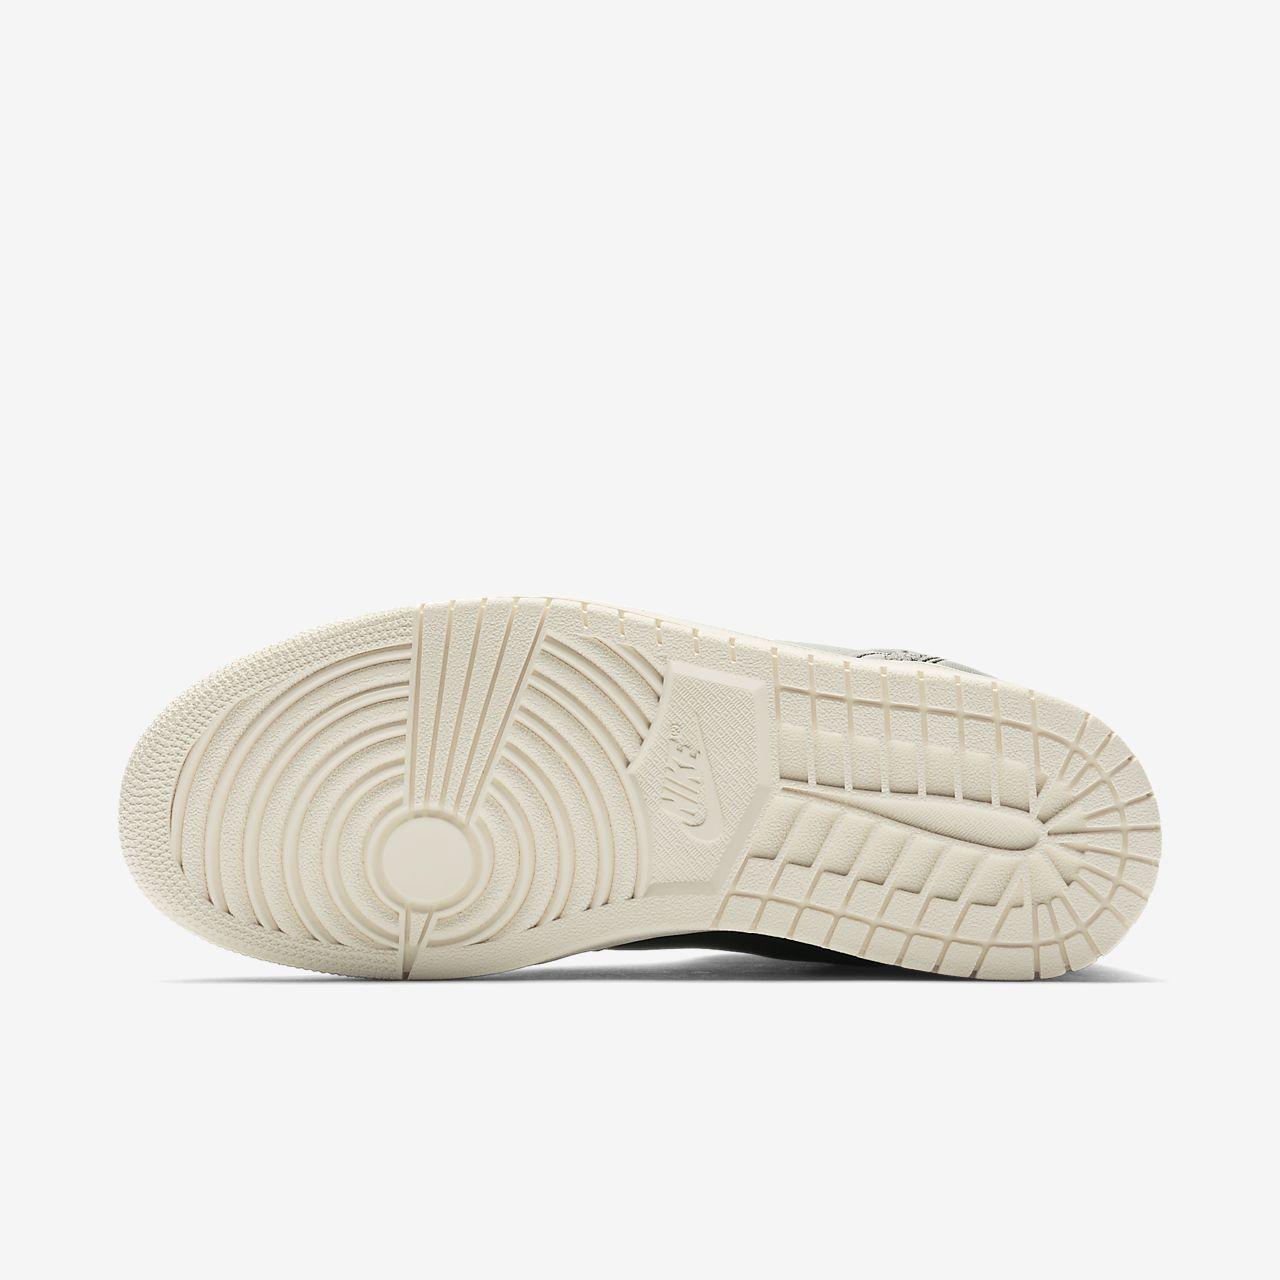 1c0bf7a48eba85 Air Jordan 1 High Zip Women s Shoe. Nike.com